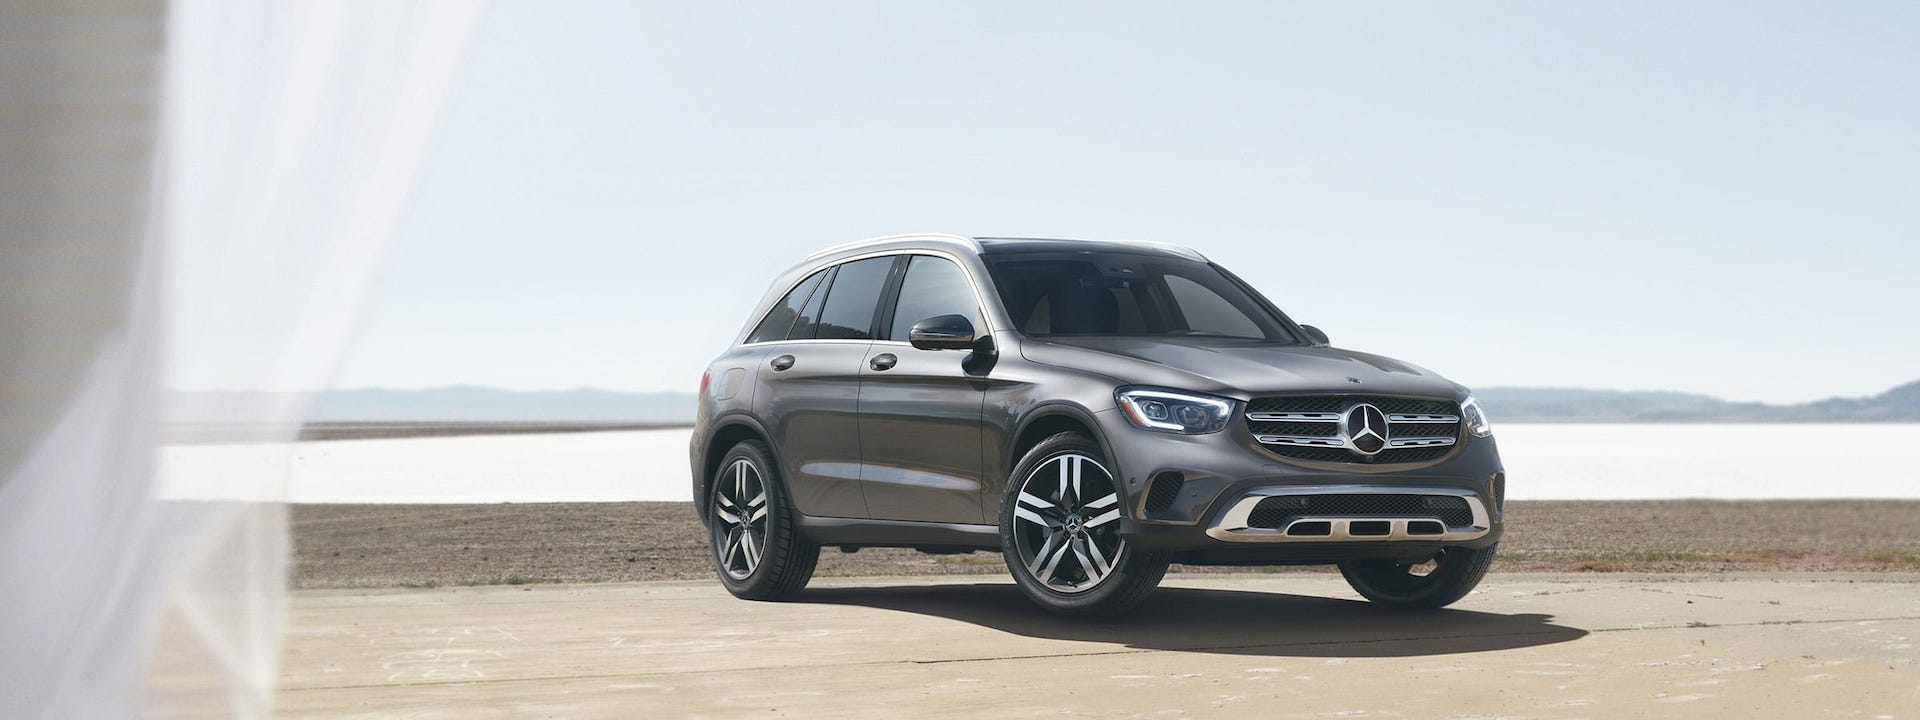 2020 Mercedes-Benz GLC SUV | Mercedes-Benz of Fort Walton Beach